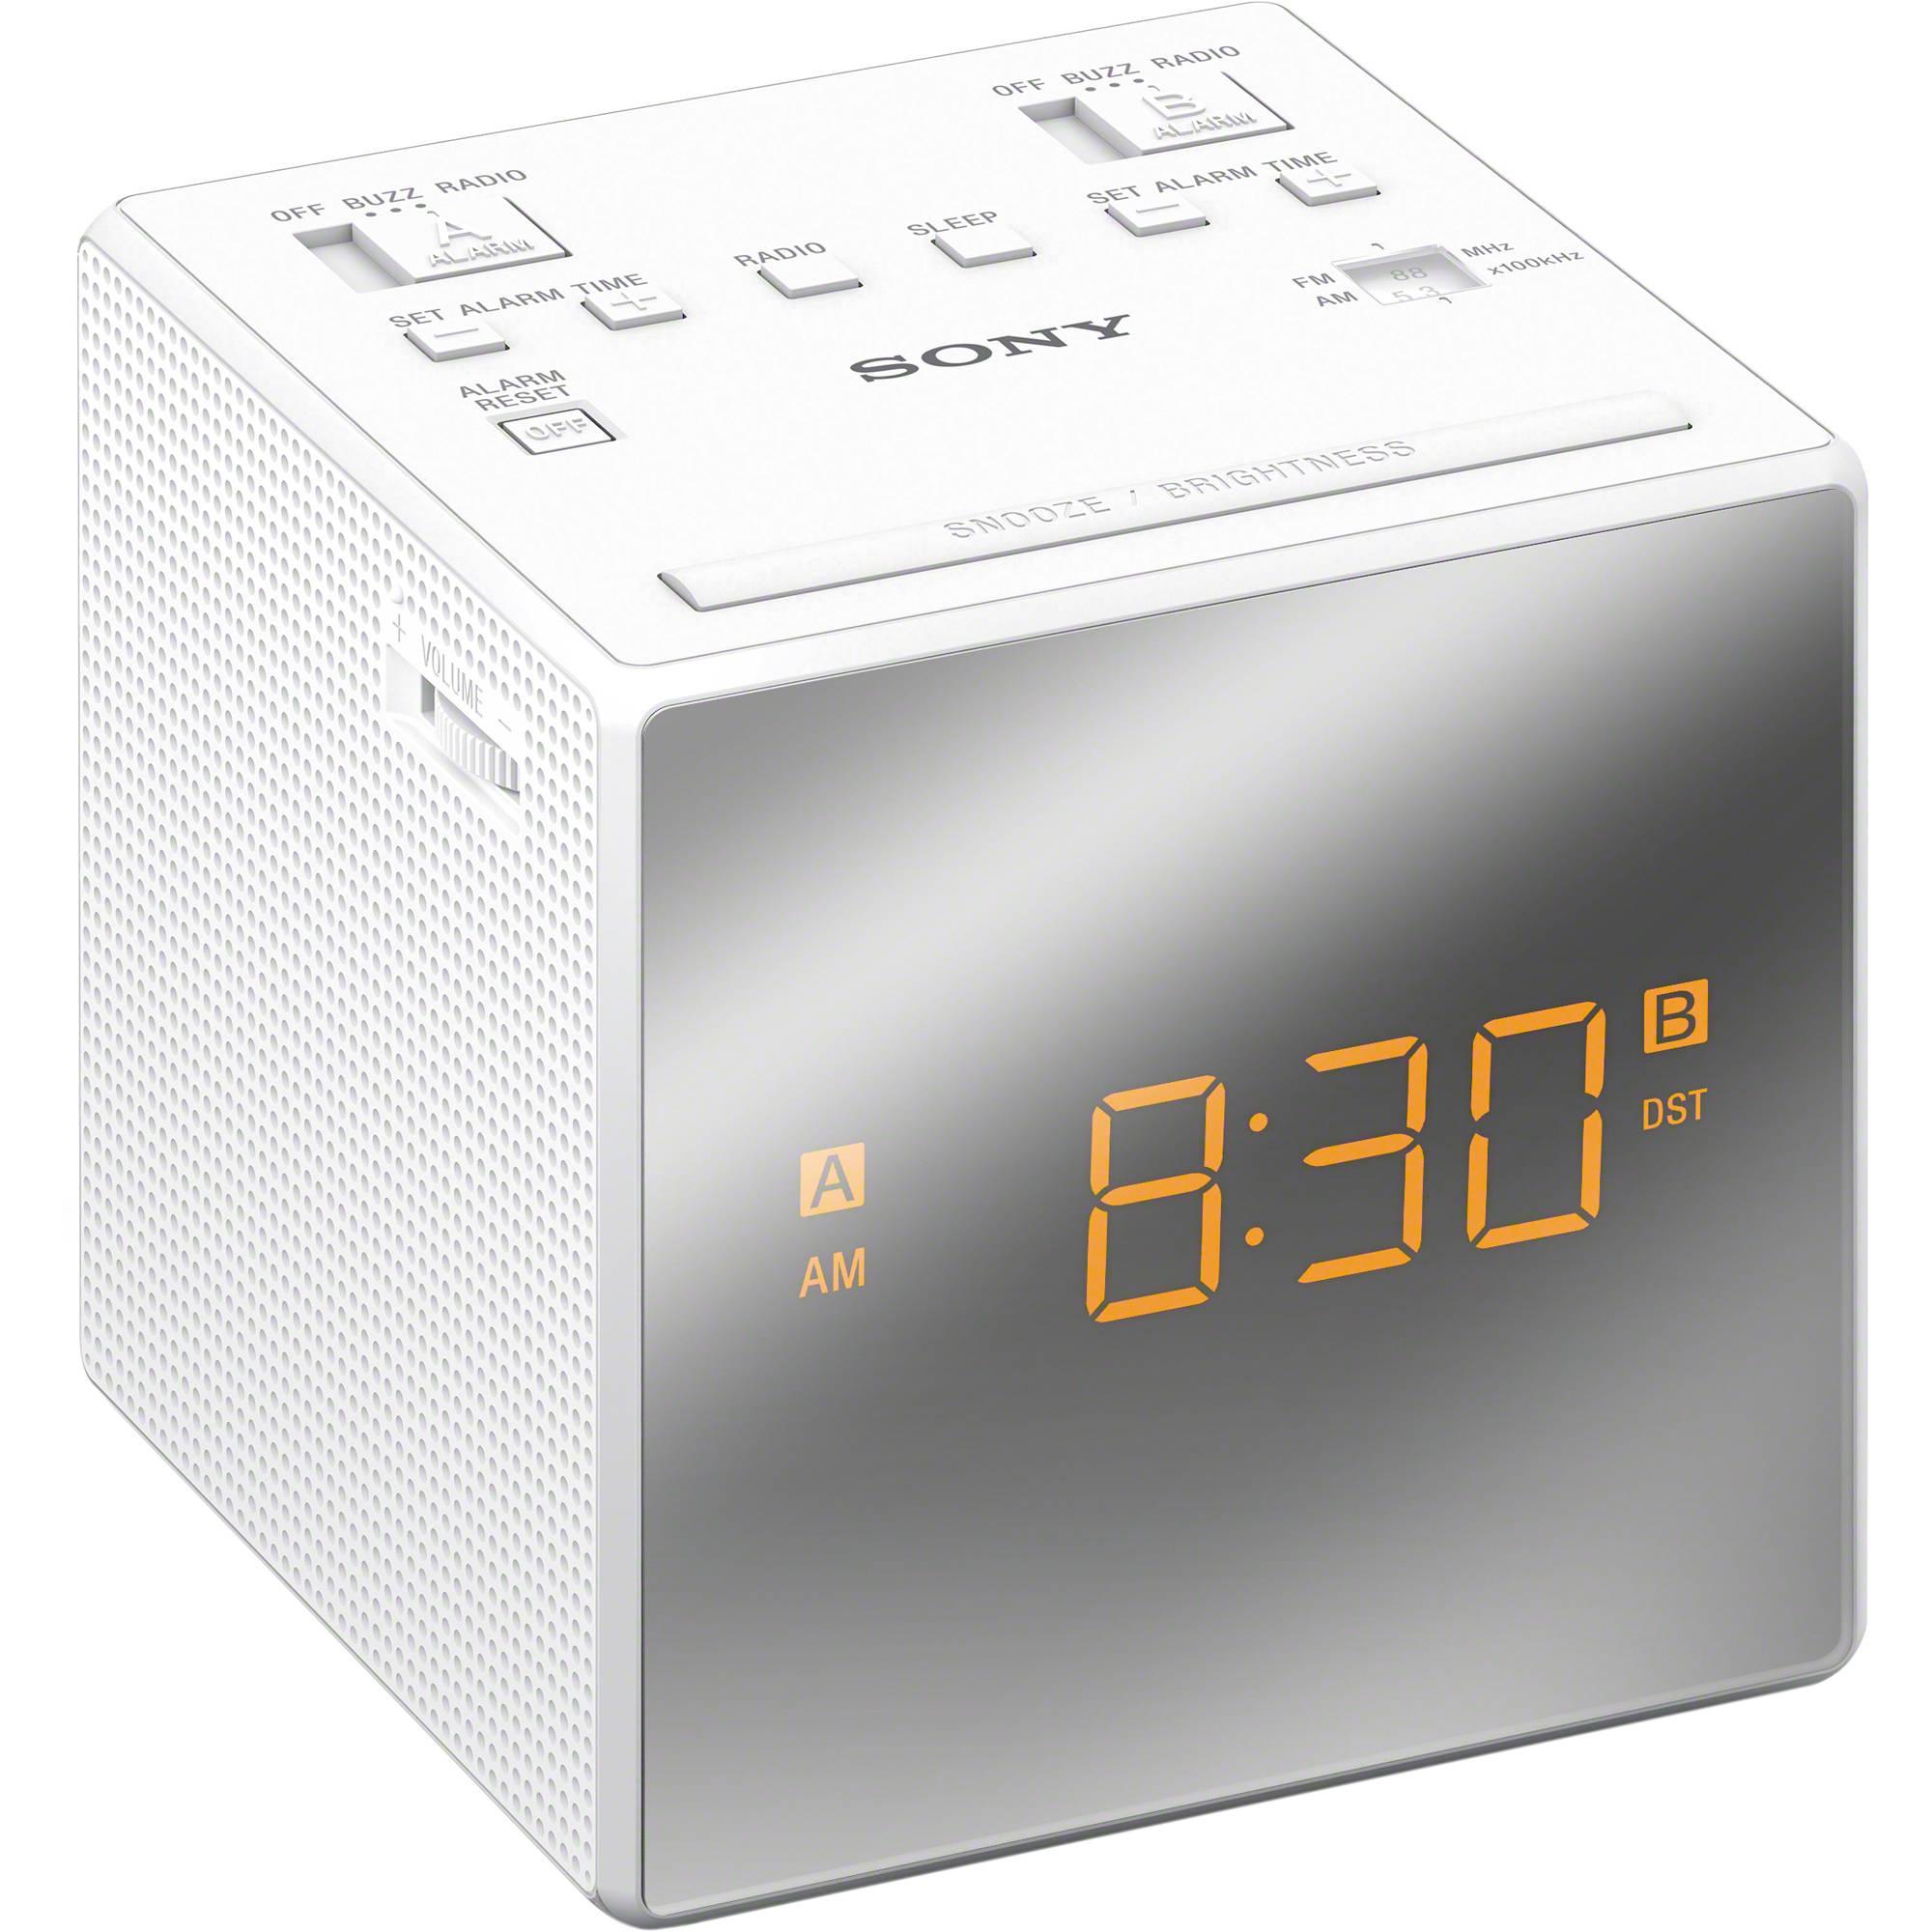 sony dual alarm clock radio white icfc1twhite b h photo video. Black Bedroom Furniture Sets. Home Design Ideas